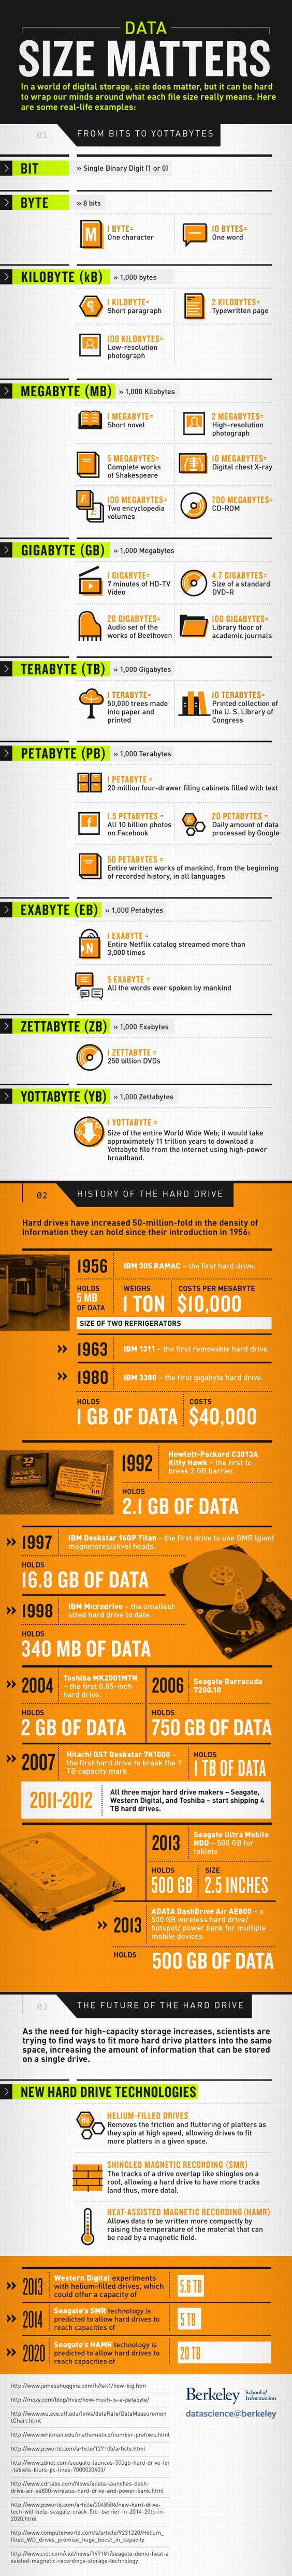 Data Size Matters Infographic via Data Science @ Berkeley.